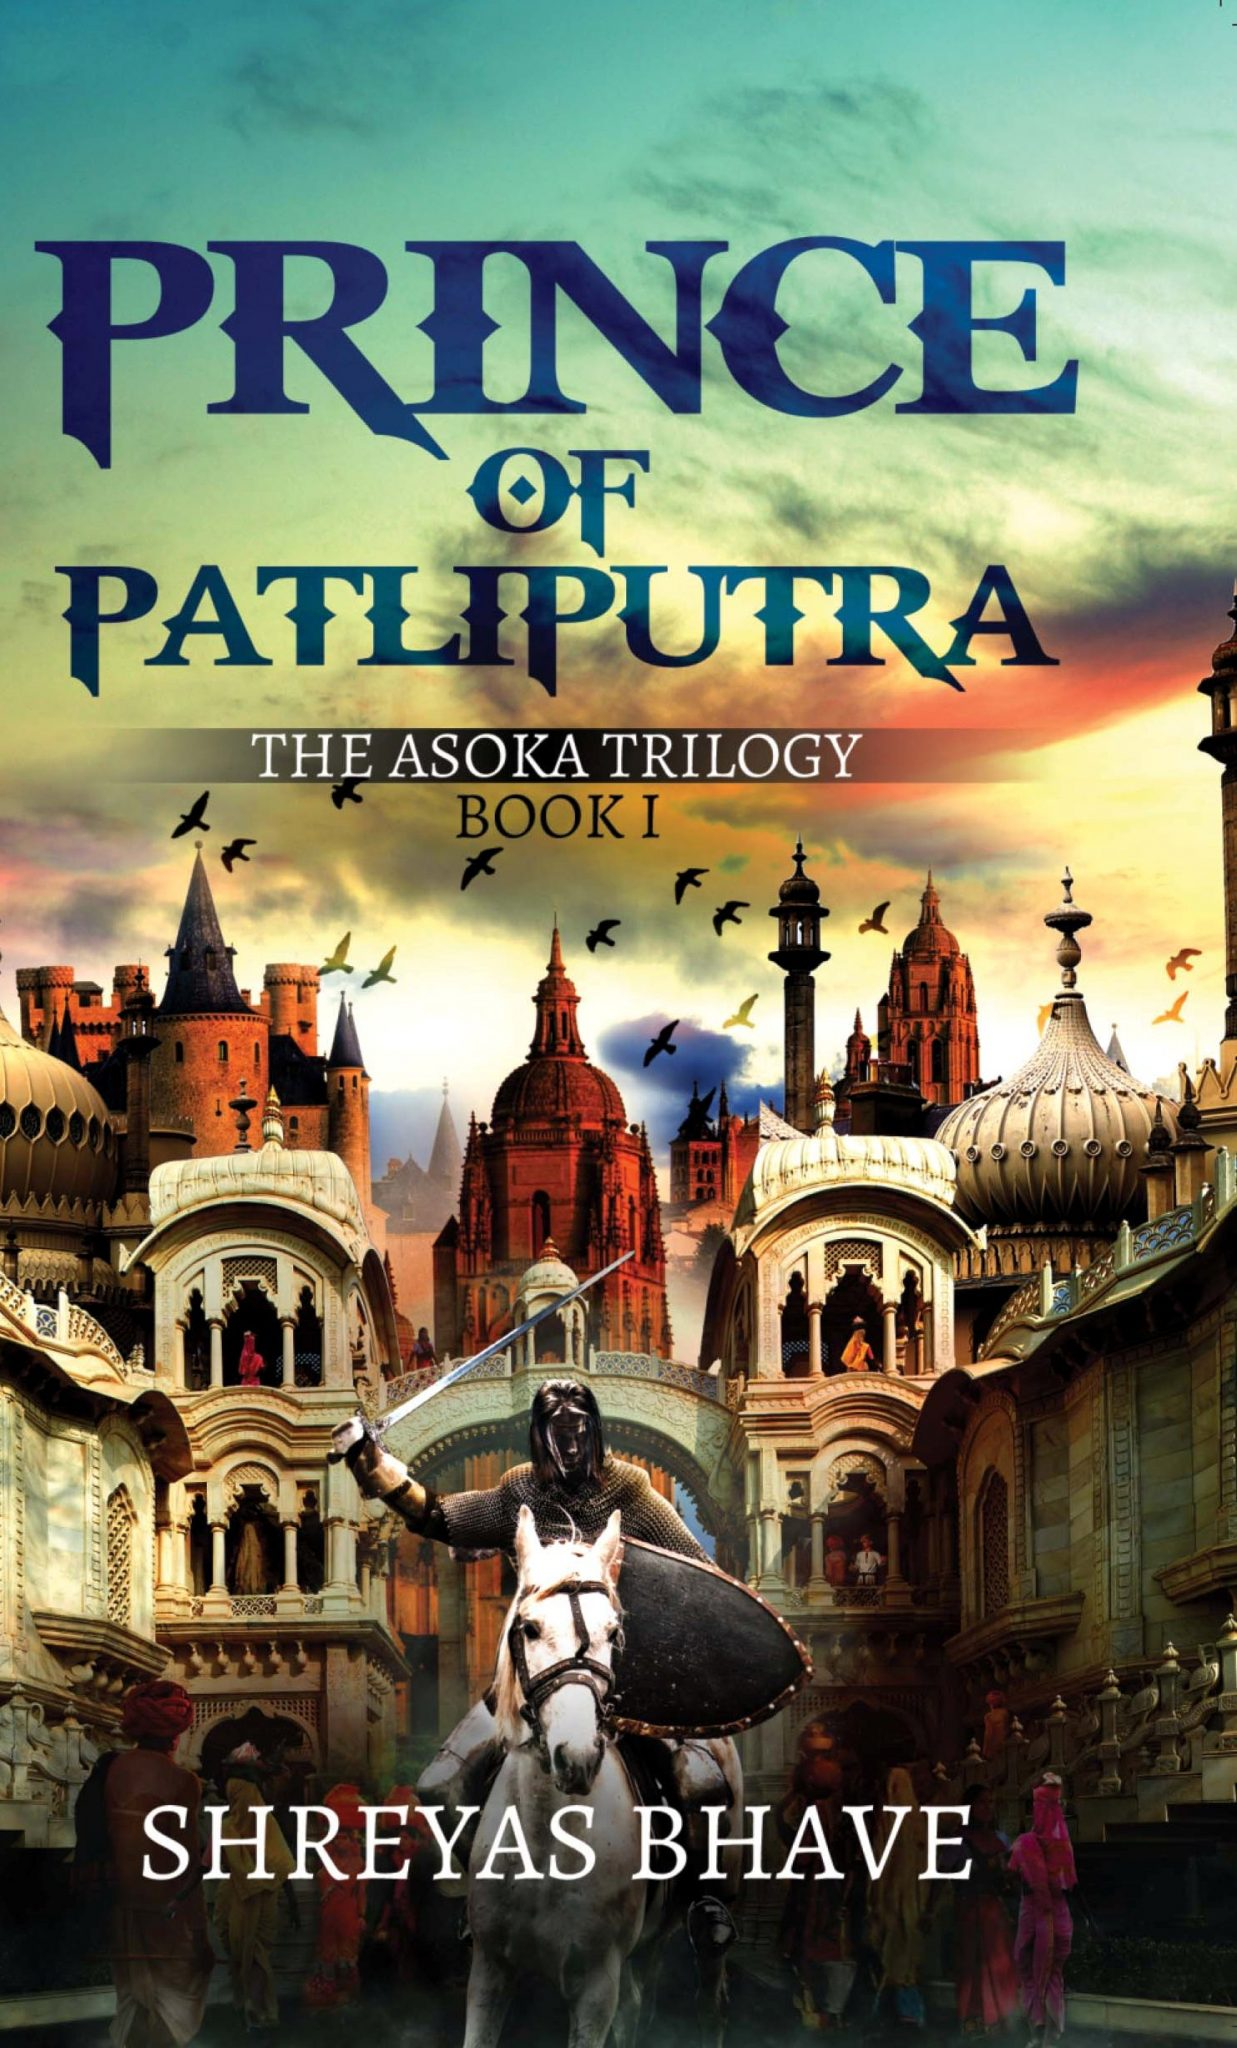 Prince Of Patliputra - Shreyas Bhave